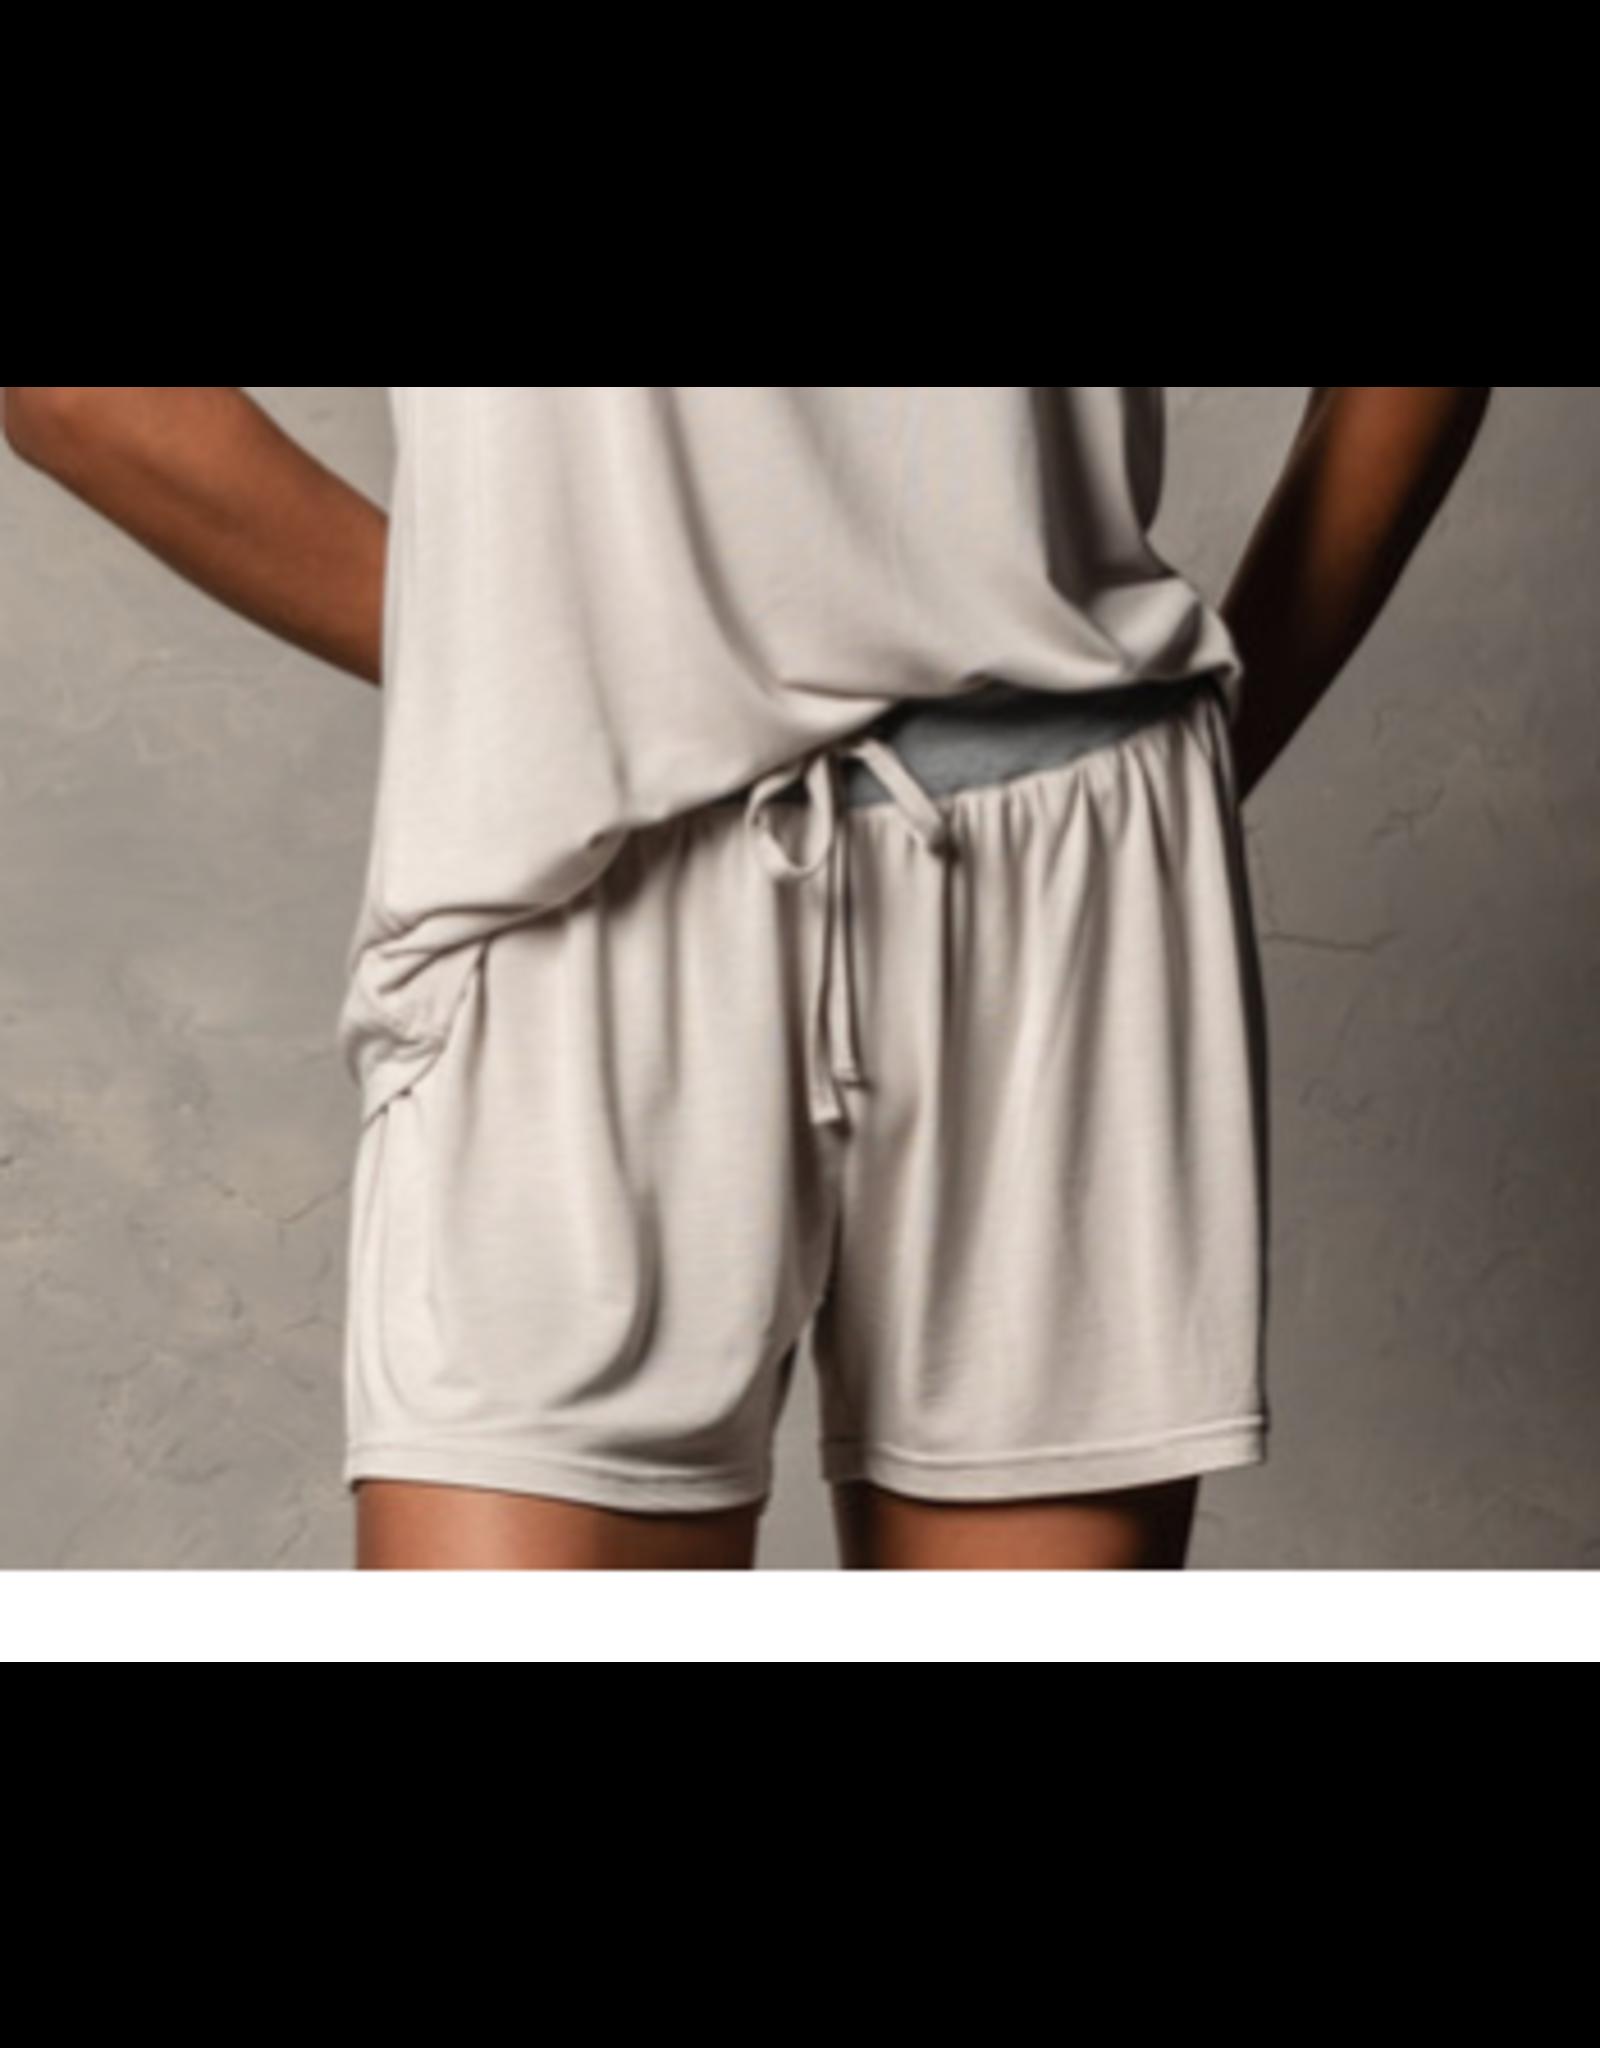 Bamboo Shorts, pebble M/L